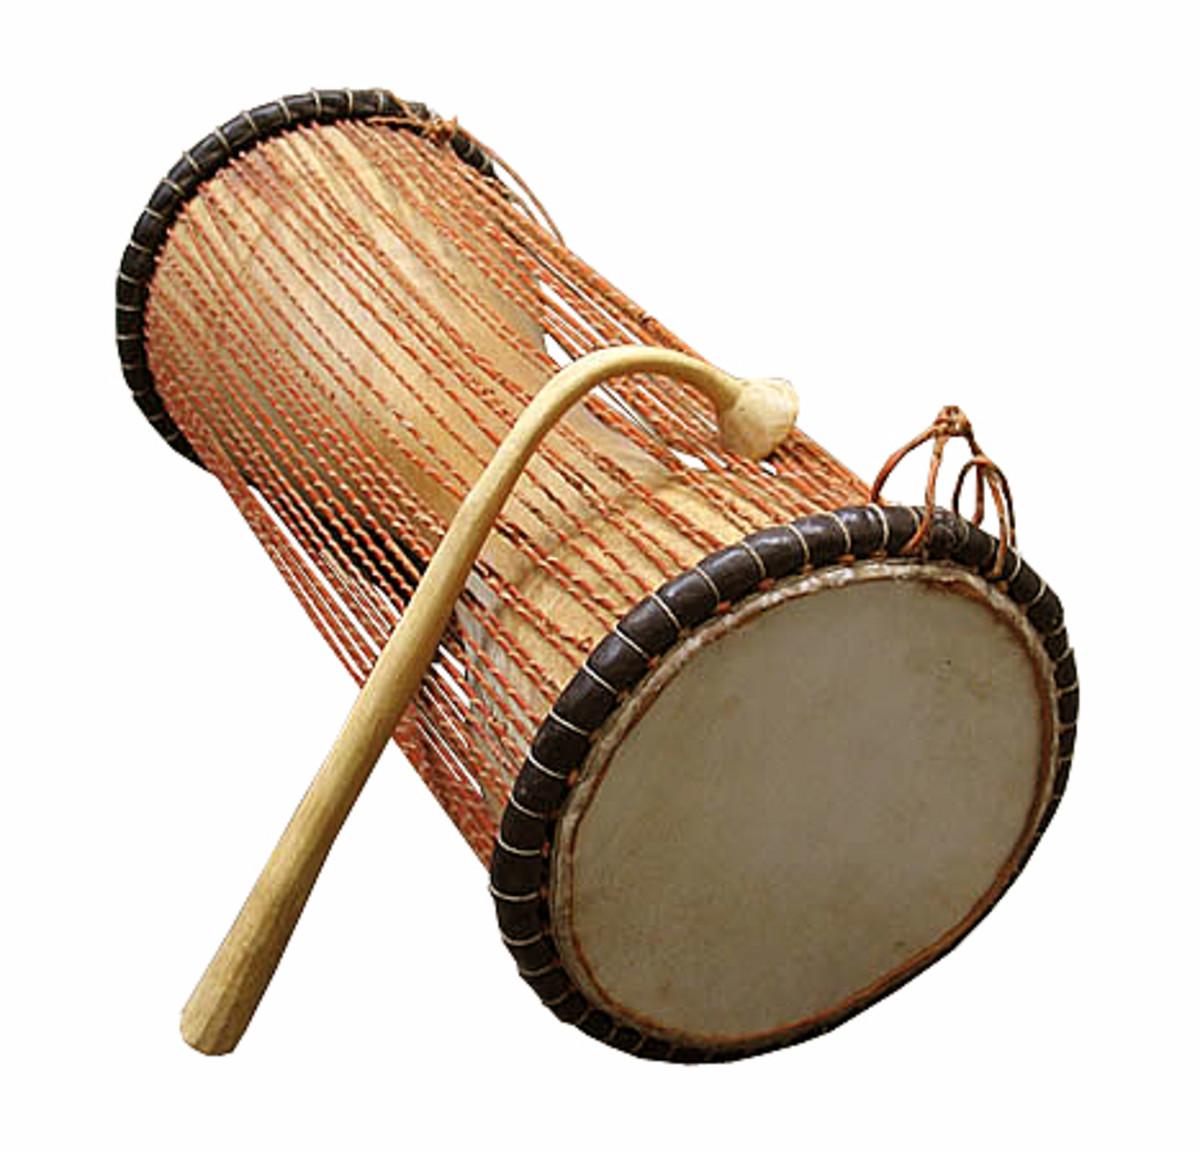 The talking drum Tama